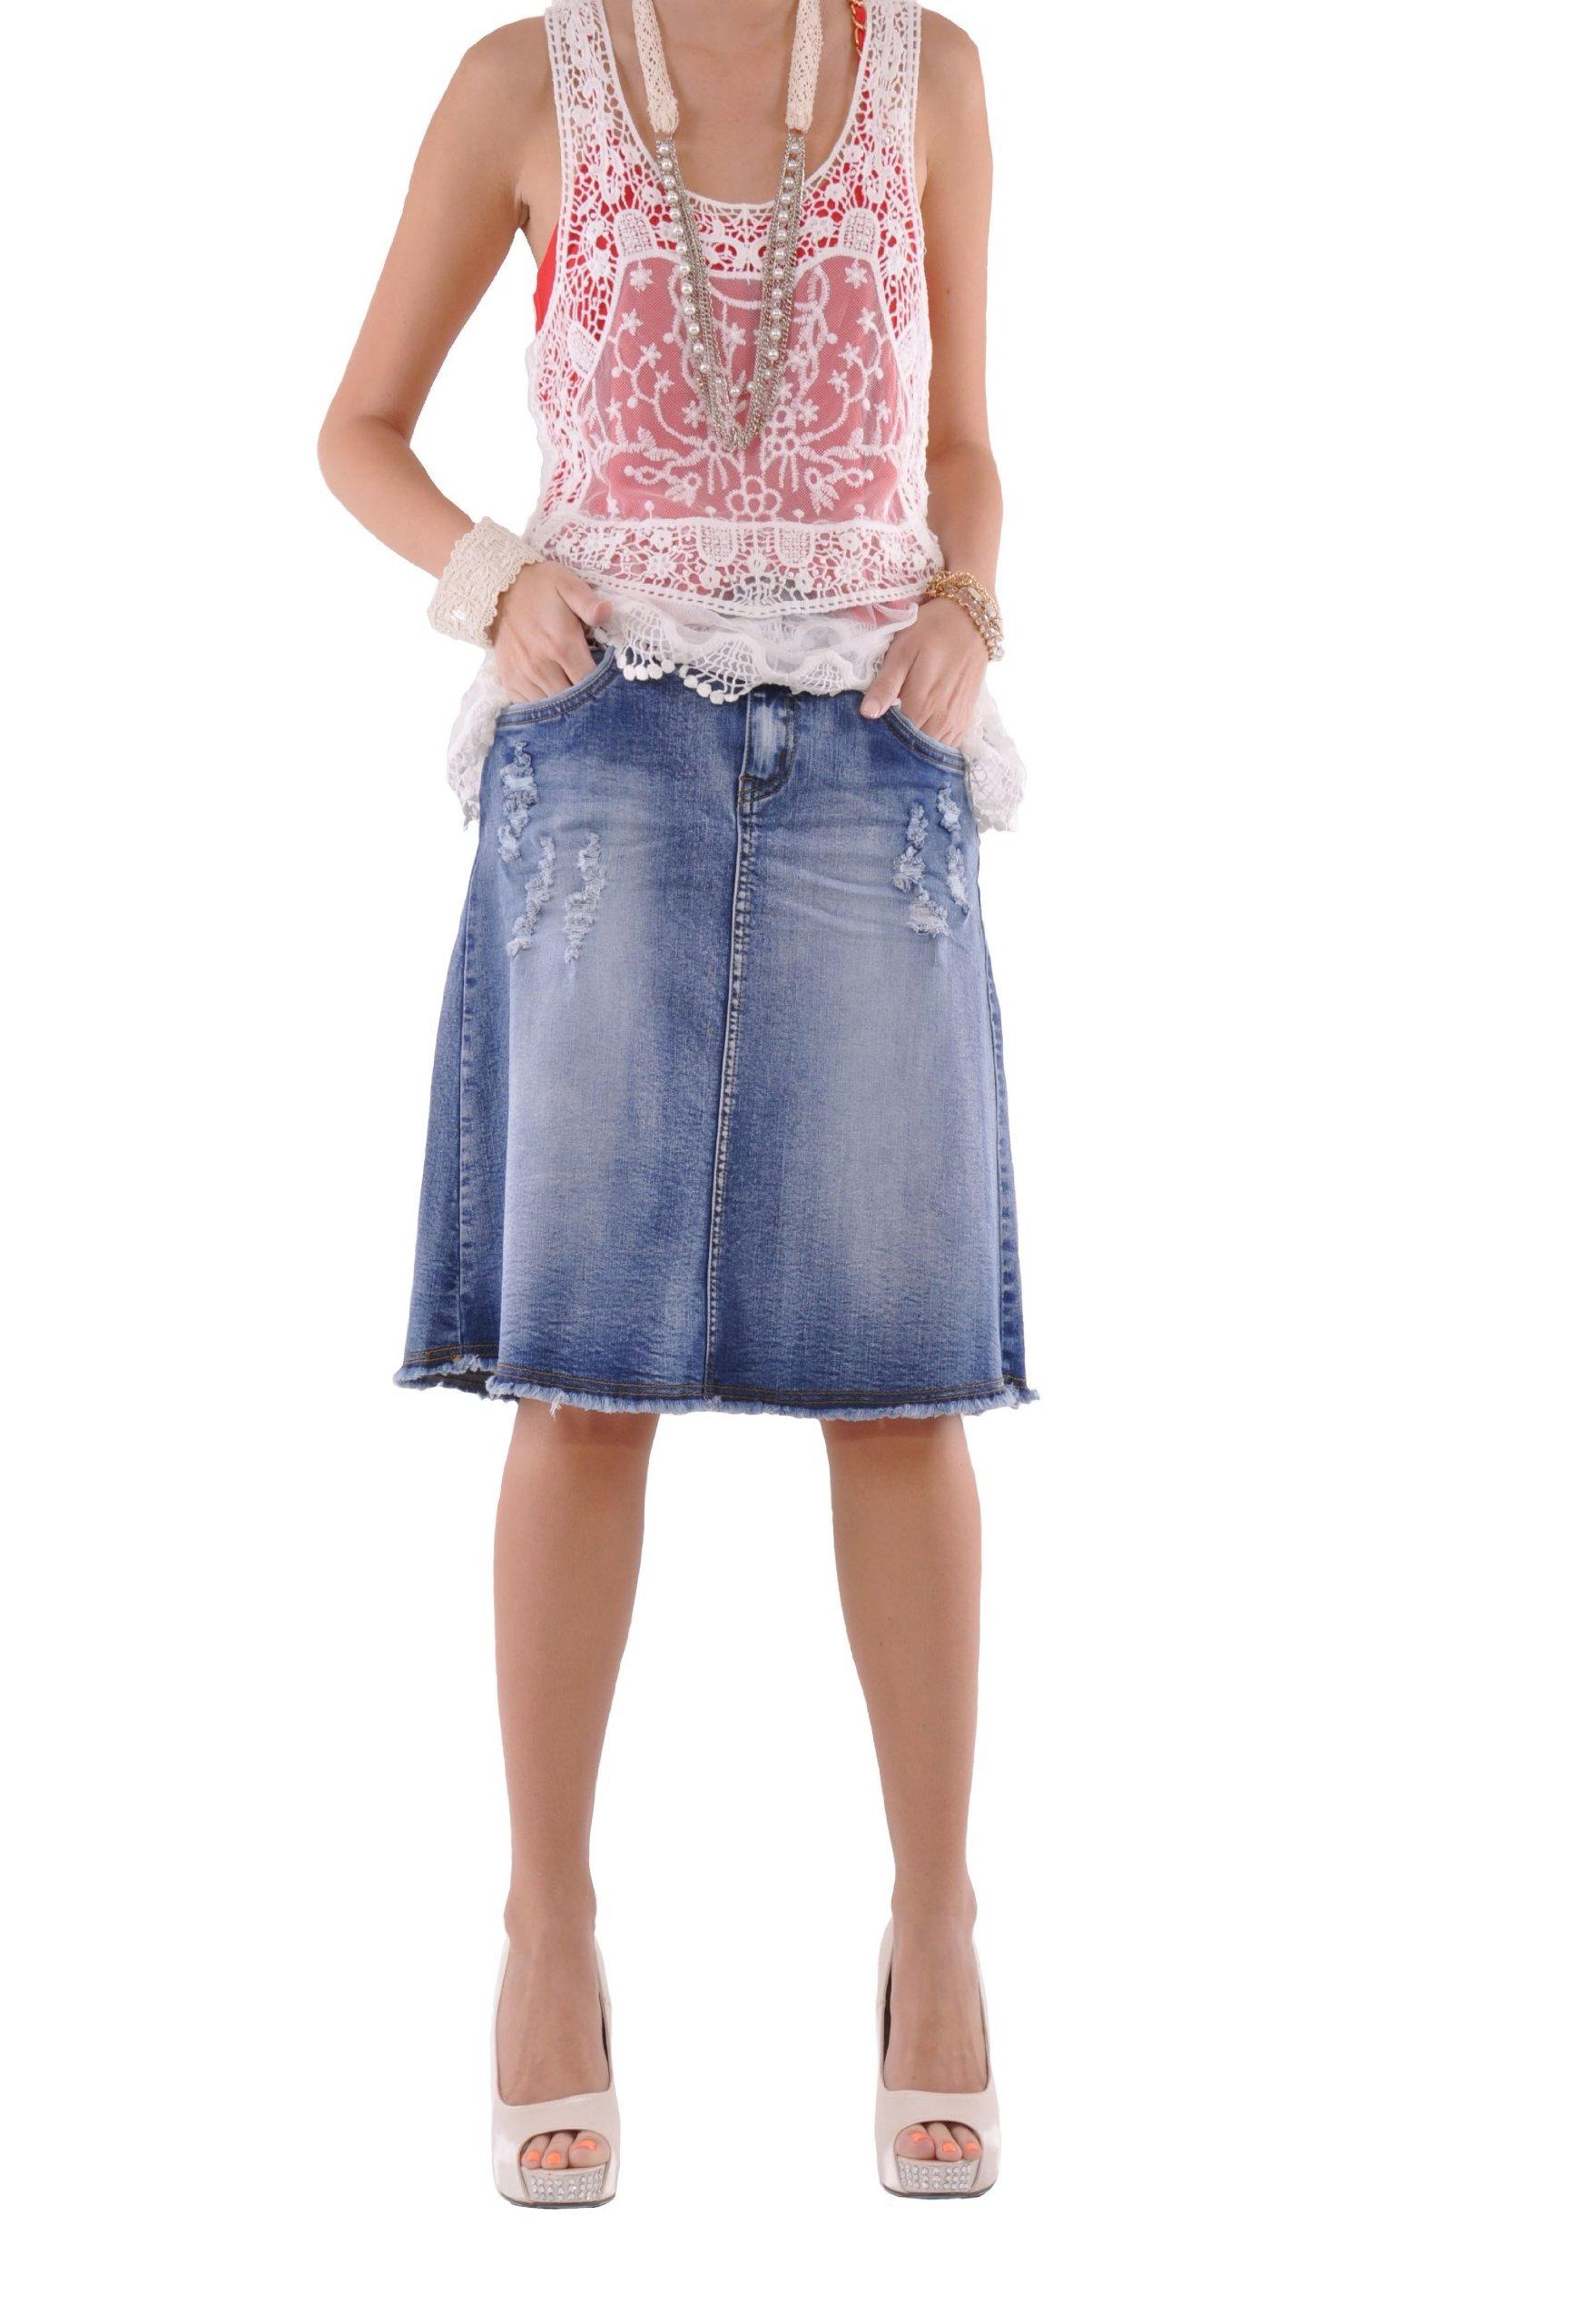 Style J Rock N Ripped Jean Skirt-Blue-32(12)